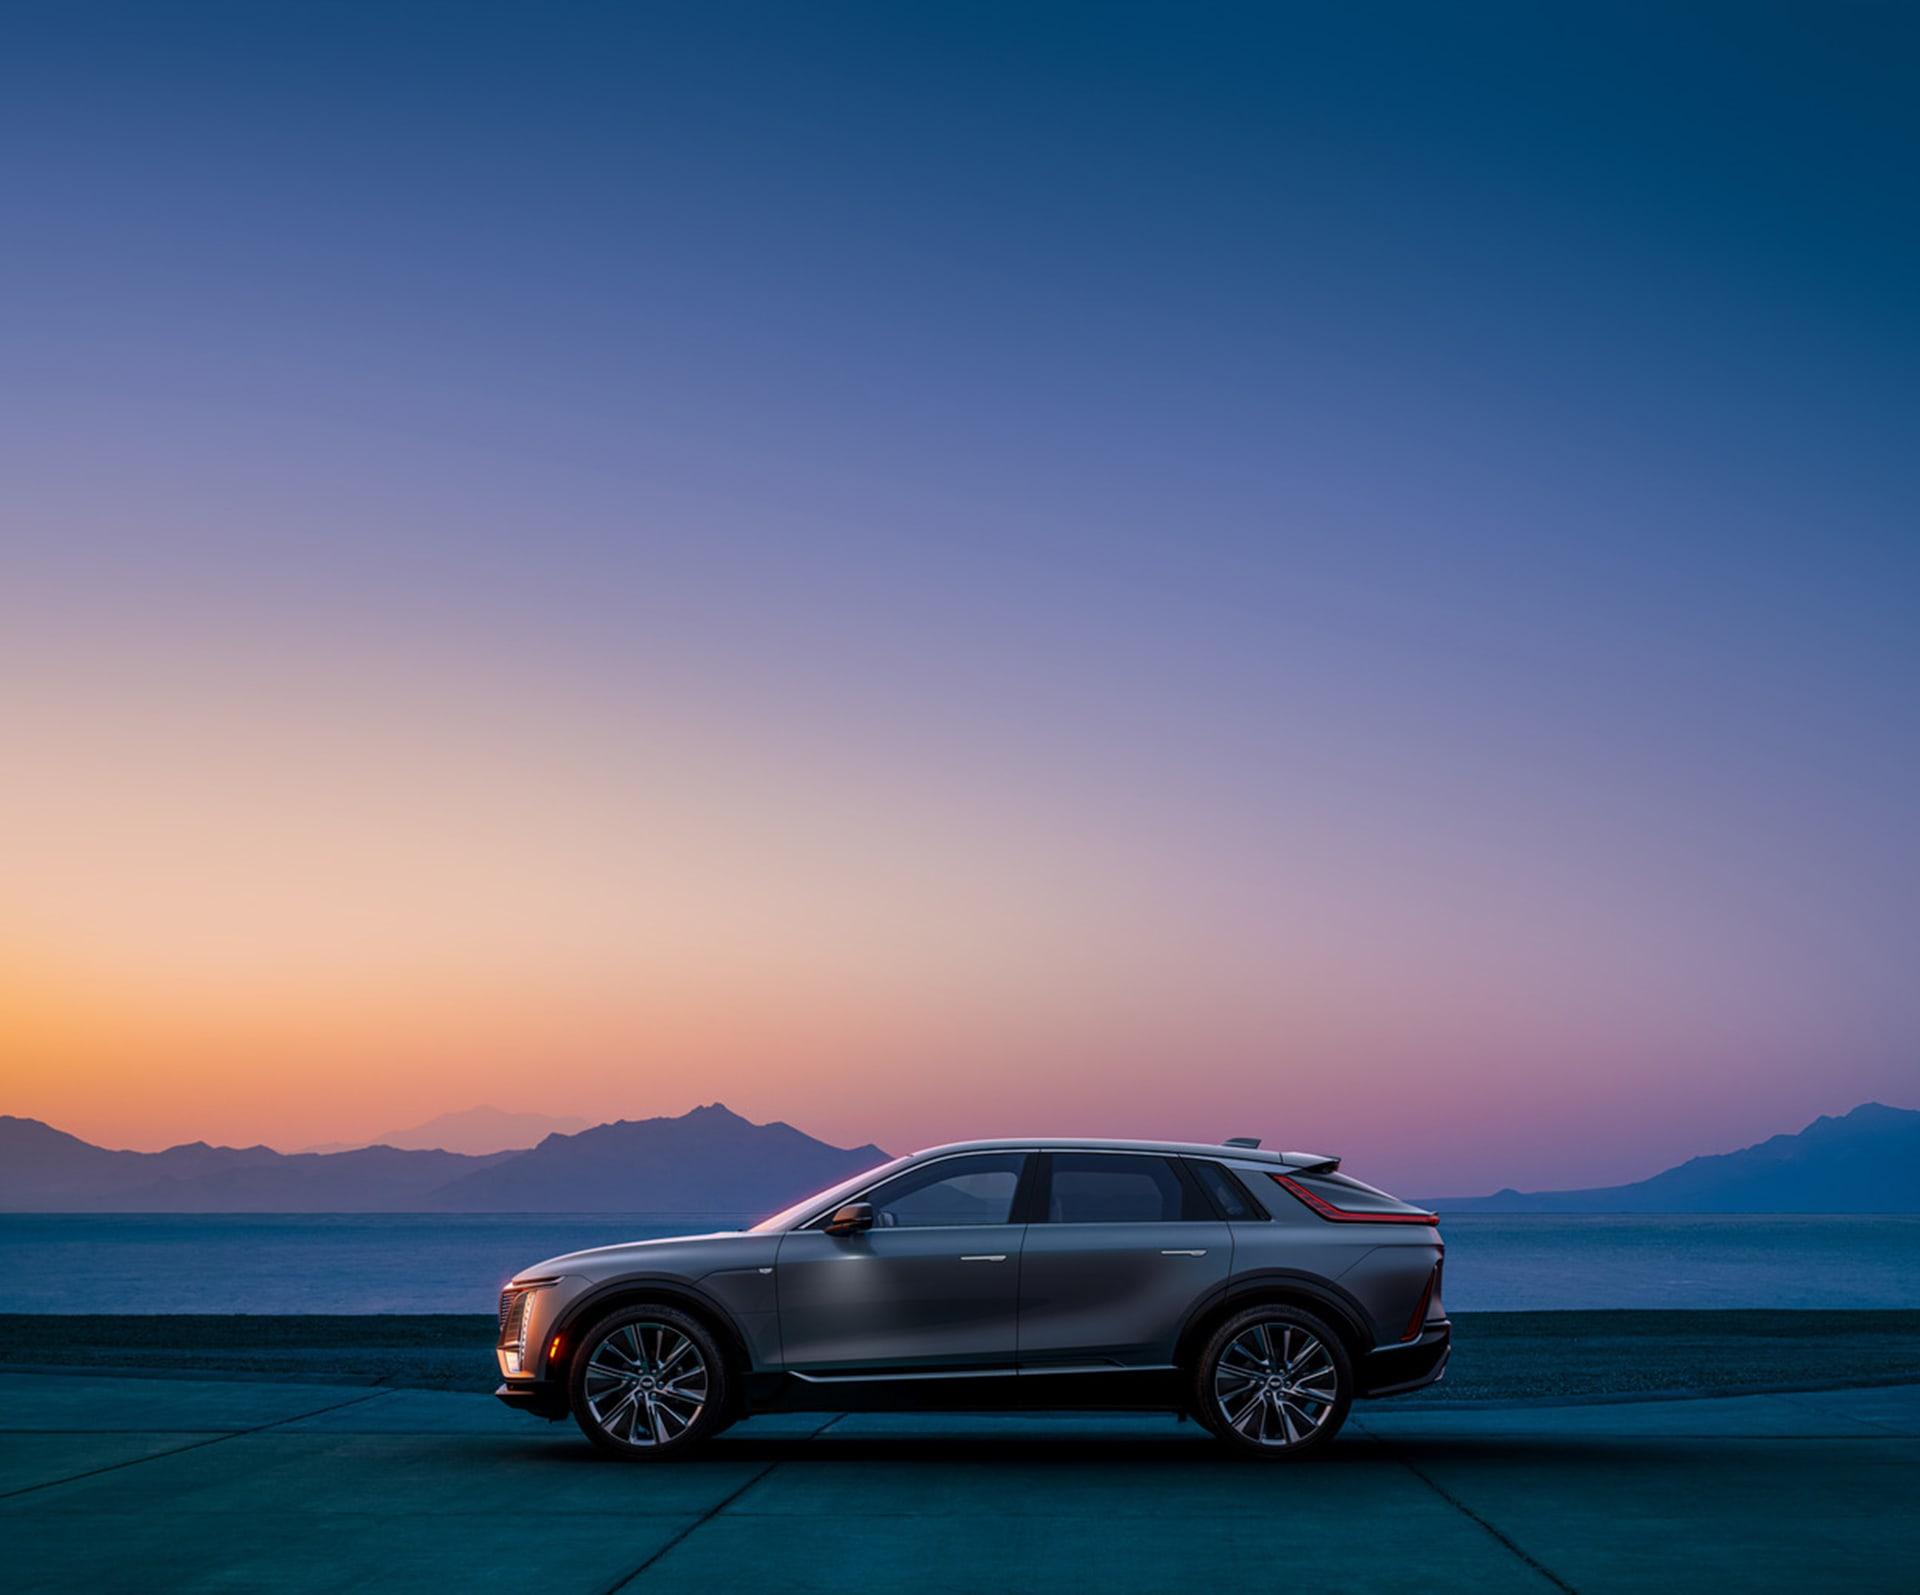 2023 Cadillac Lyriq profile at sunset